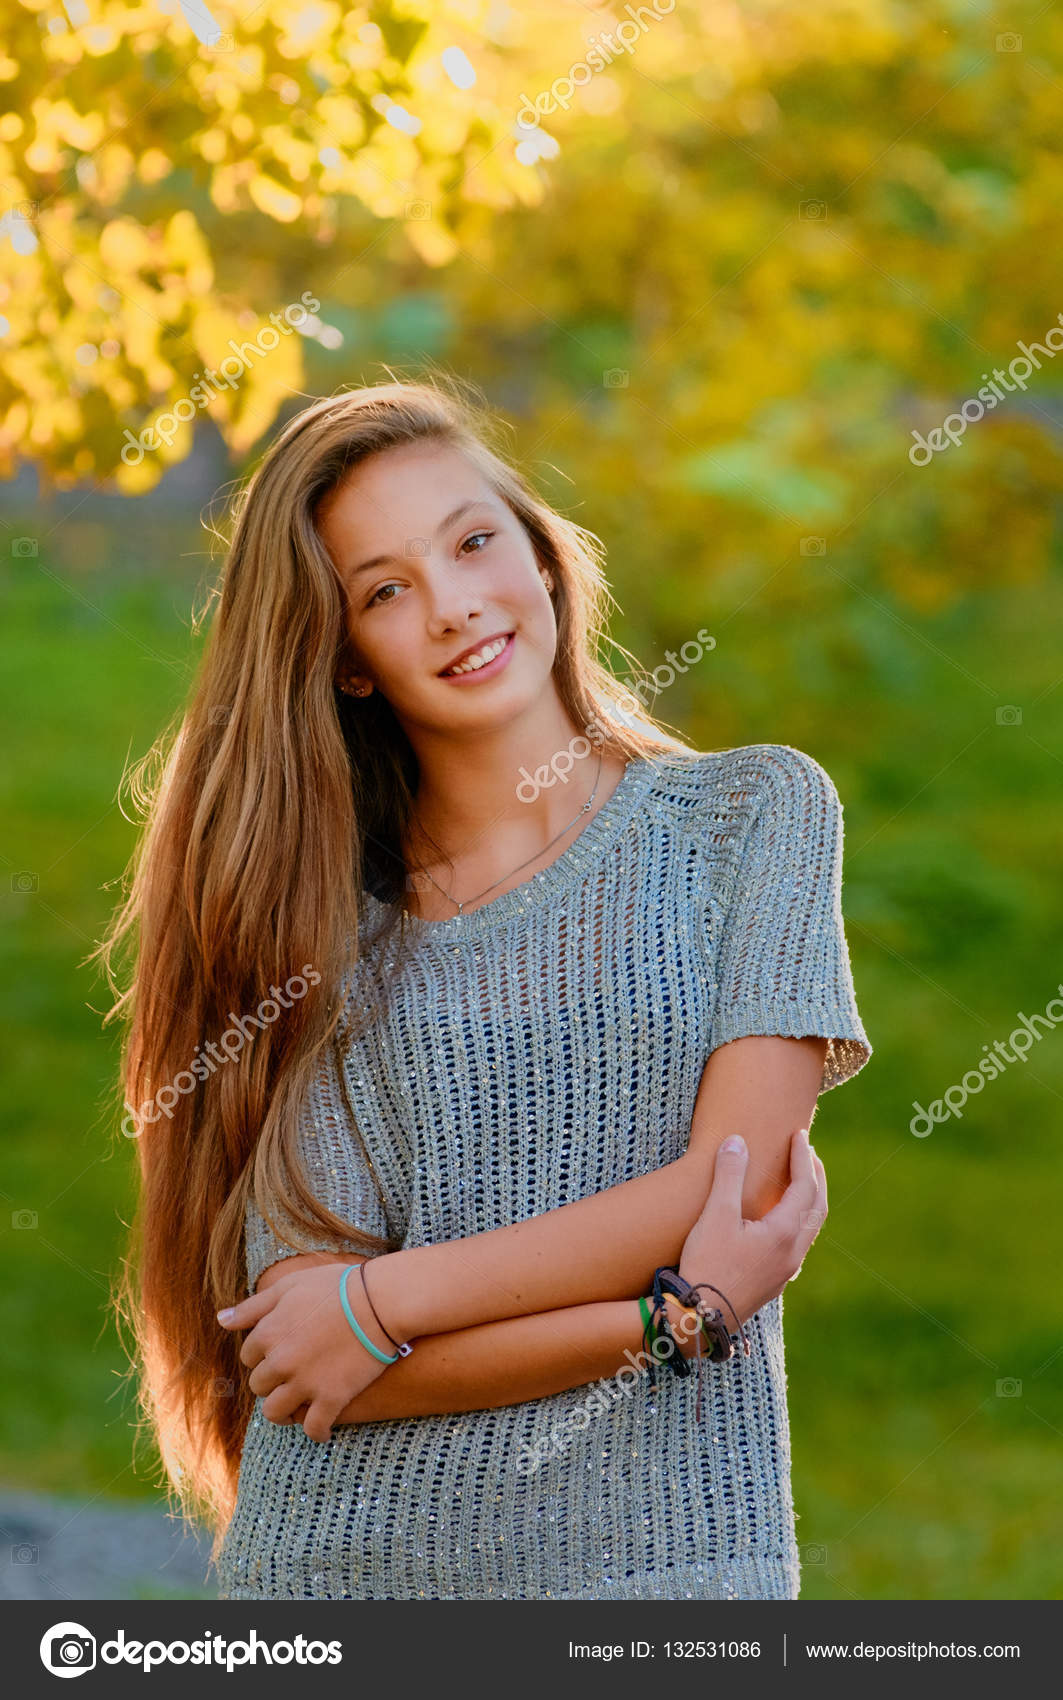 اجمل صور بنات 2020 اجمل صور بنات اطفال خلفيات بنات صغيره جميلة جدا 19